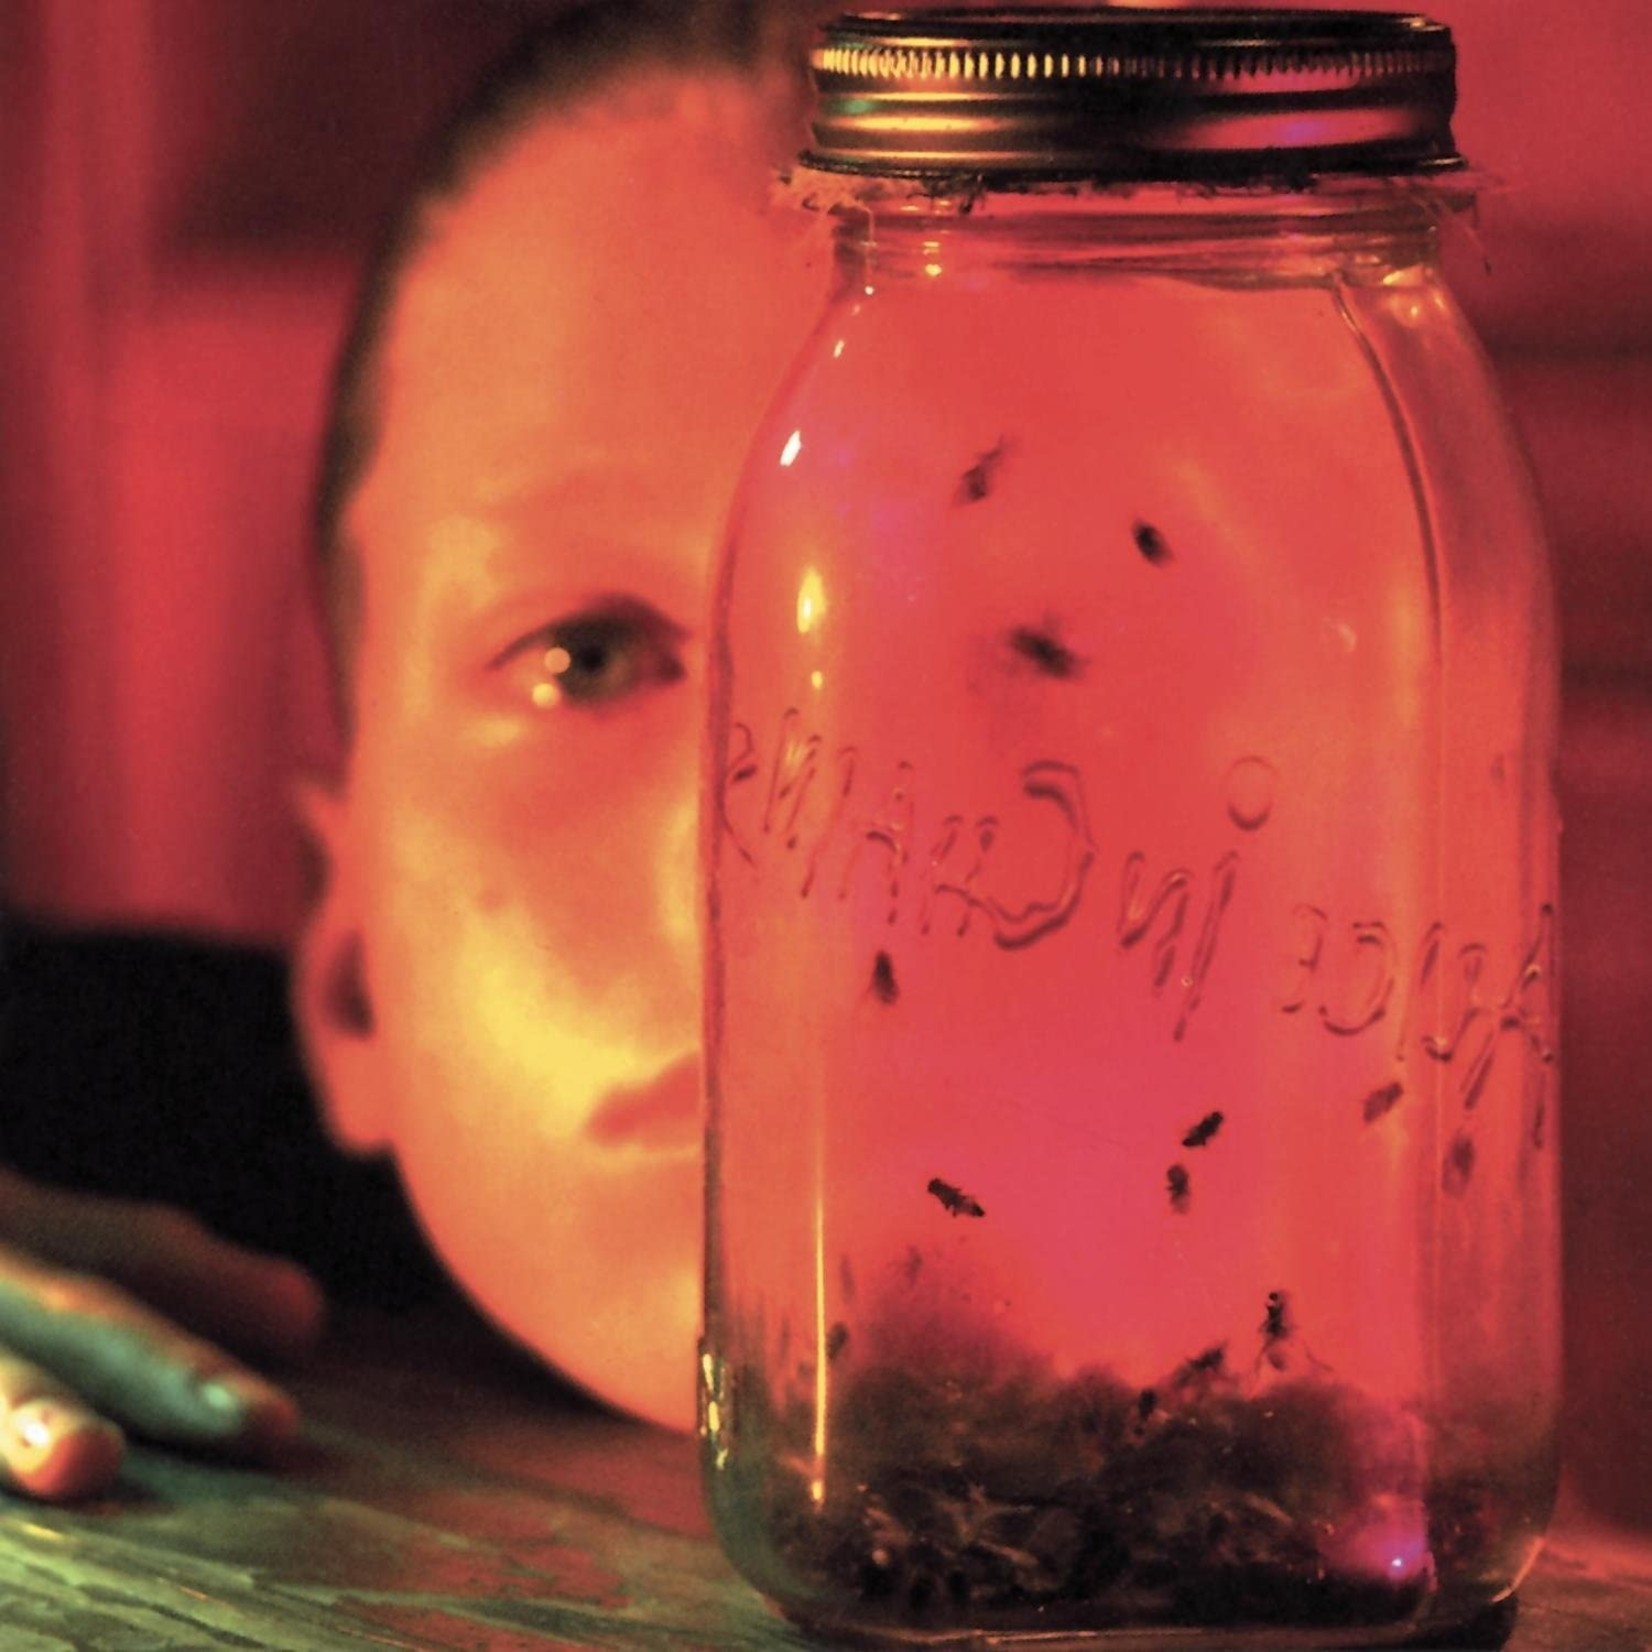 [New] Alice In Chains: Jar Of Flies / Sap (2LP)